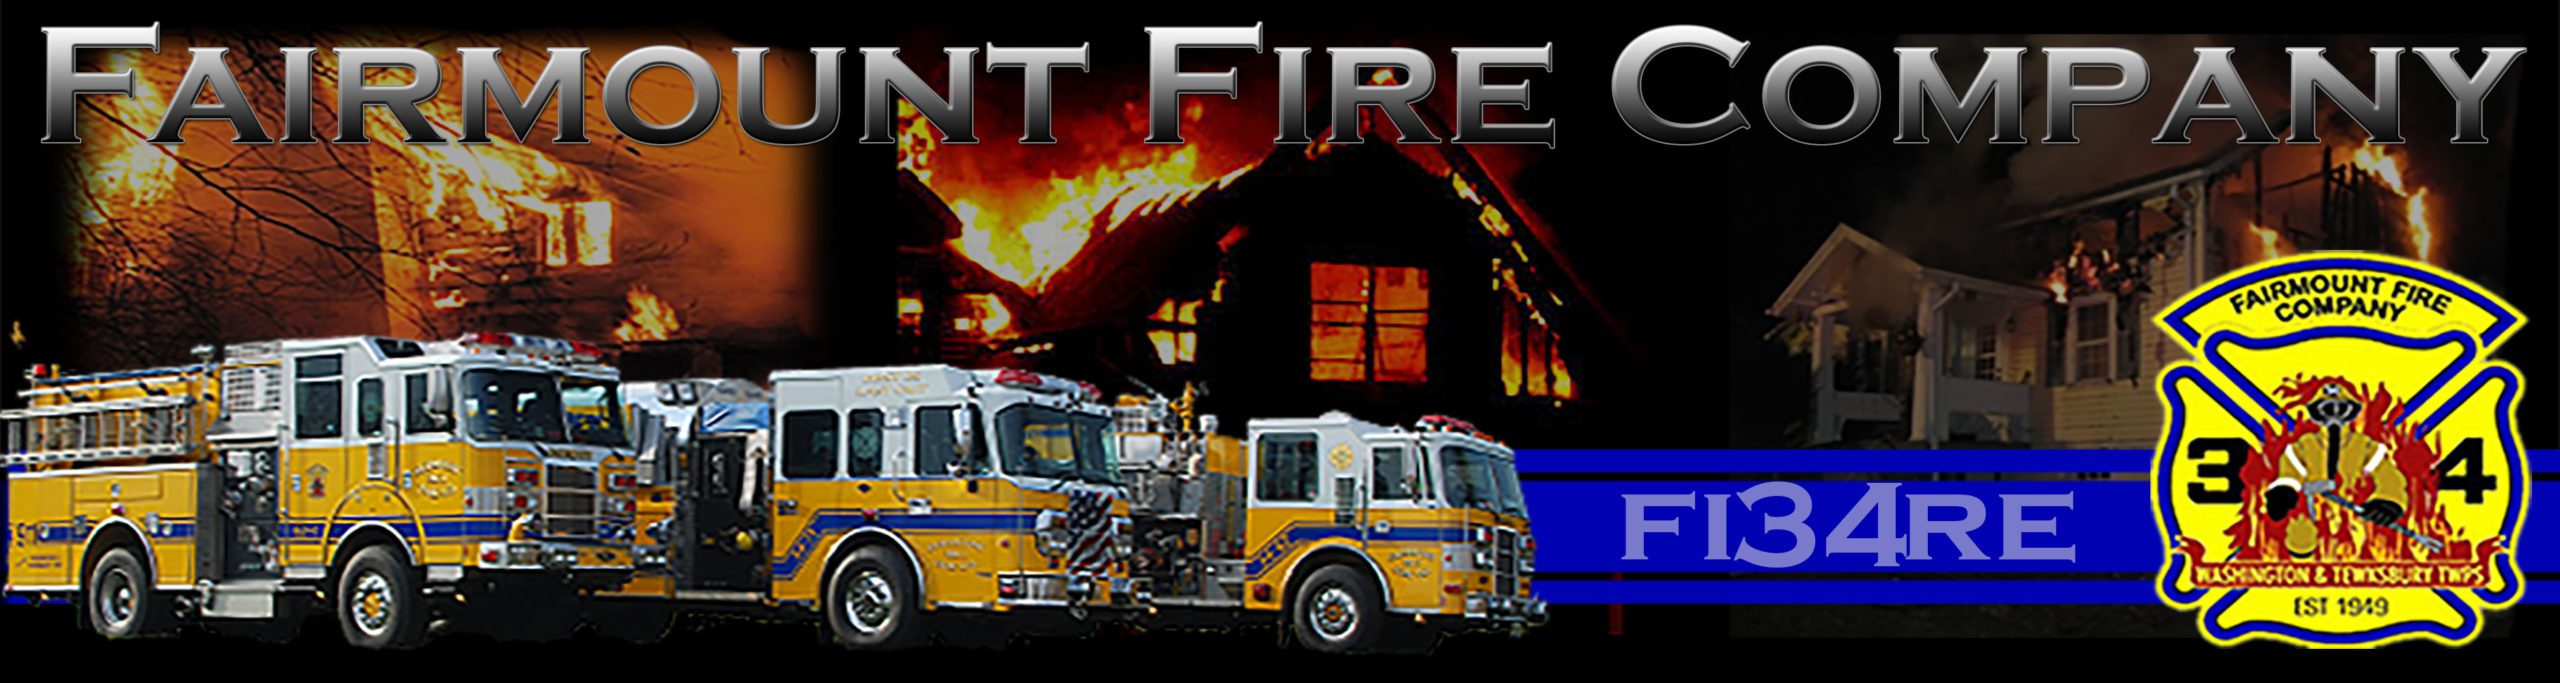 Fairmount Fire Company